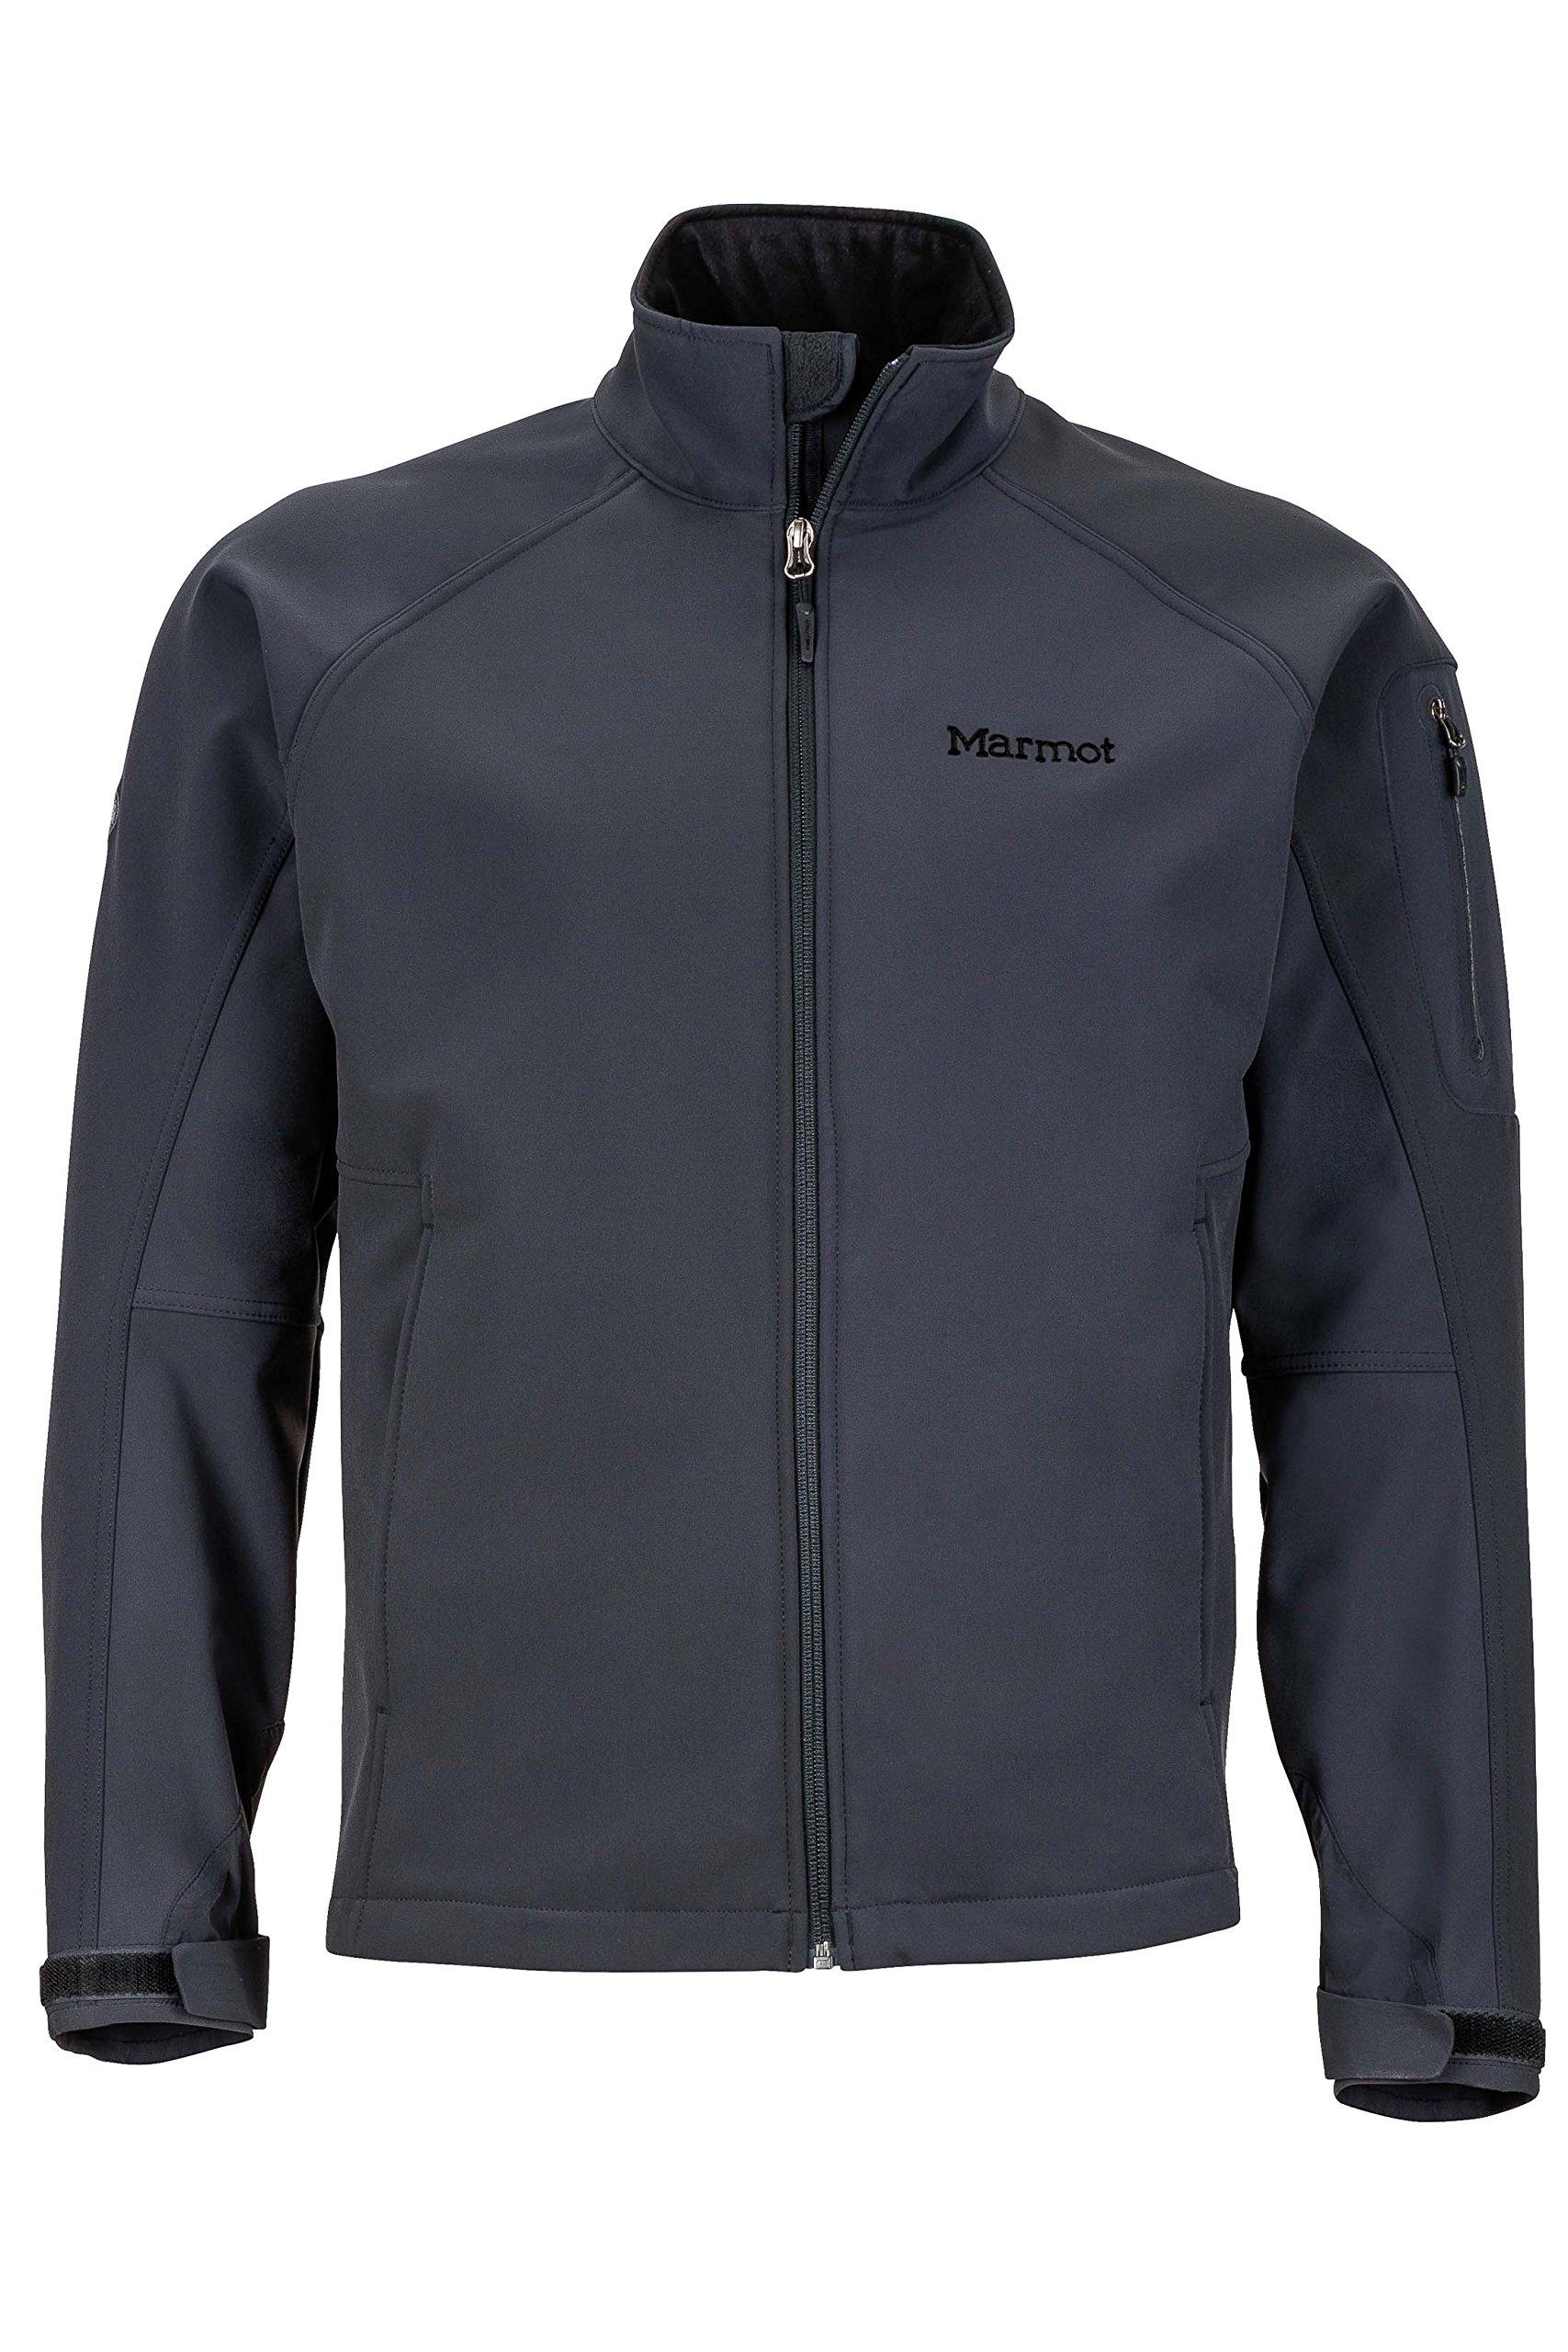 Marmot Gravity Men's Softshell Windbreaker Jacket, Jet Black, Large by Marmot